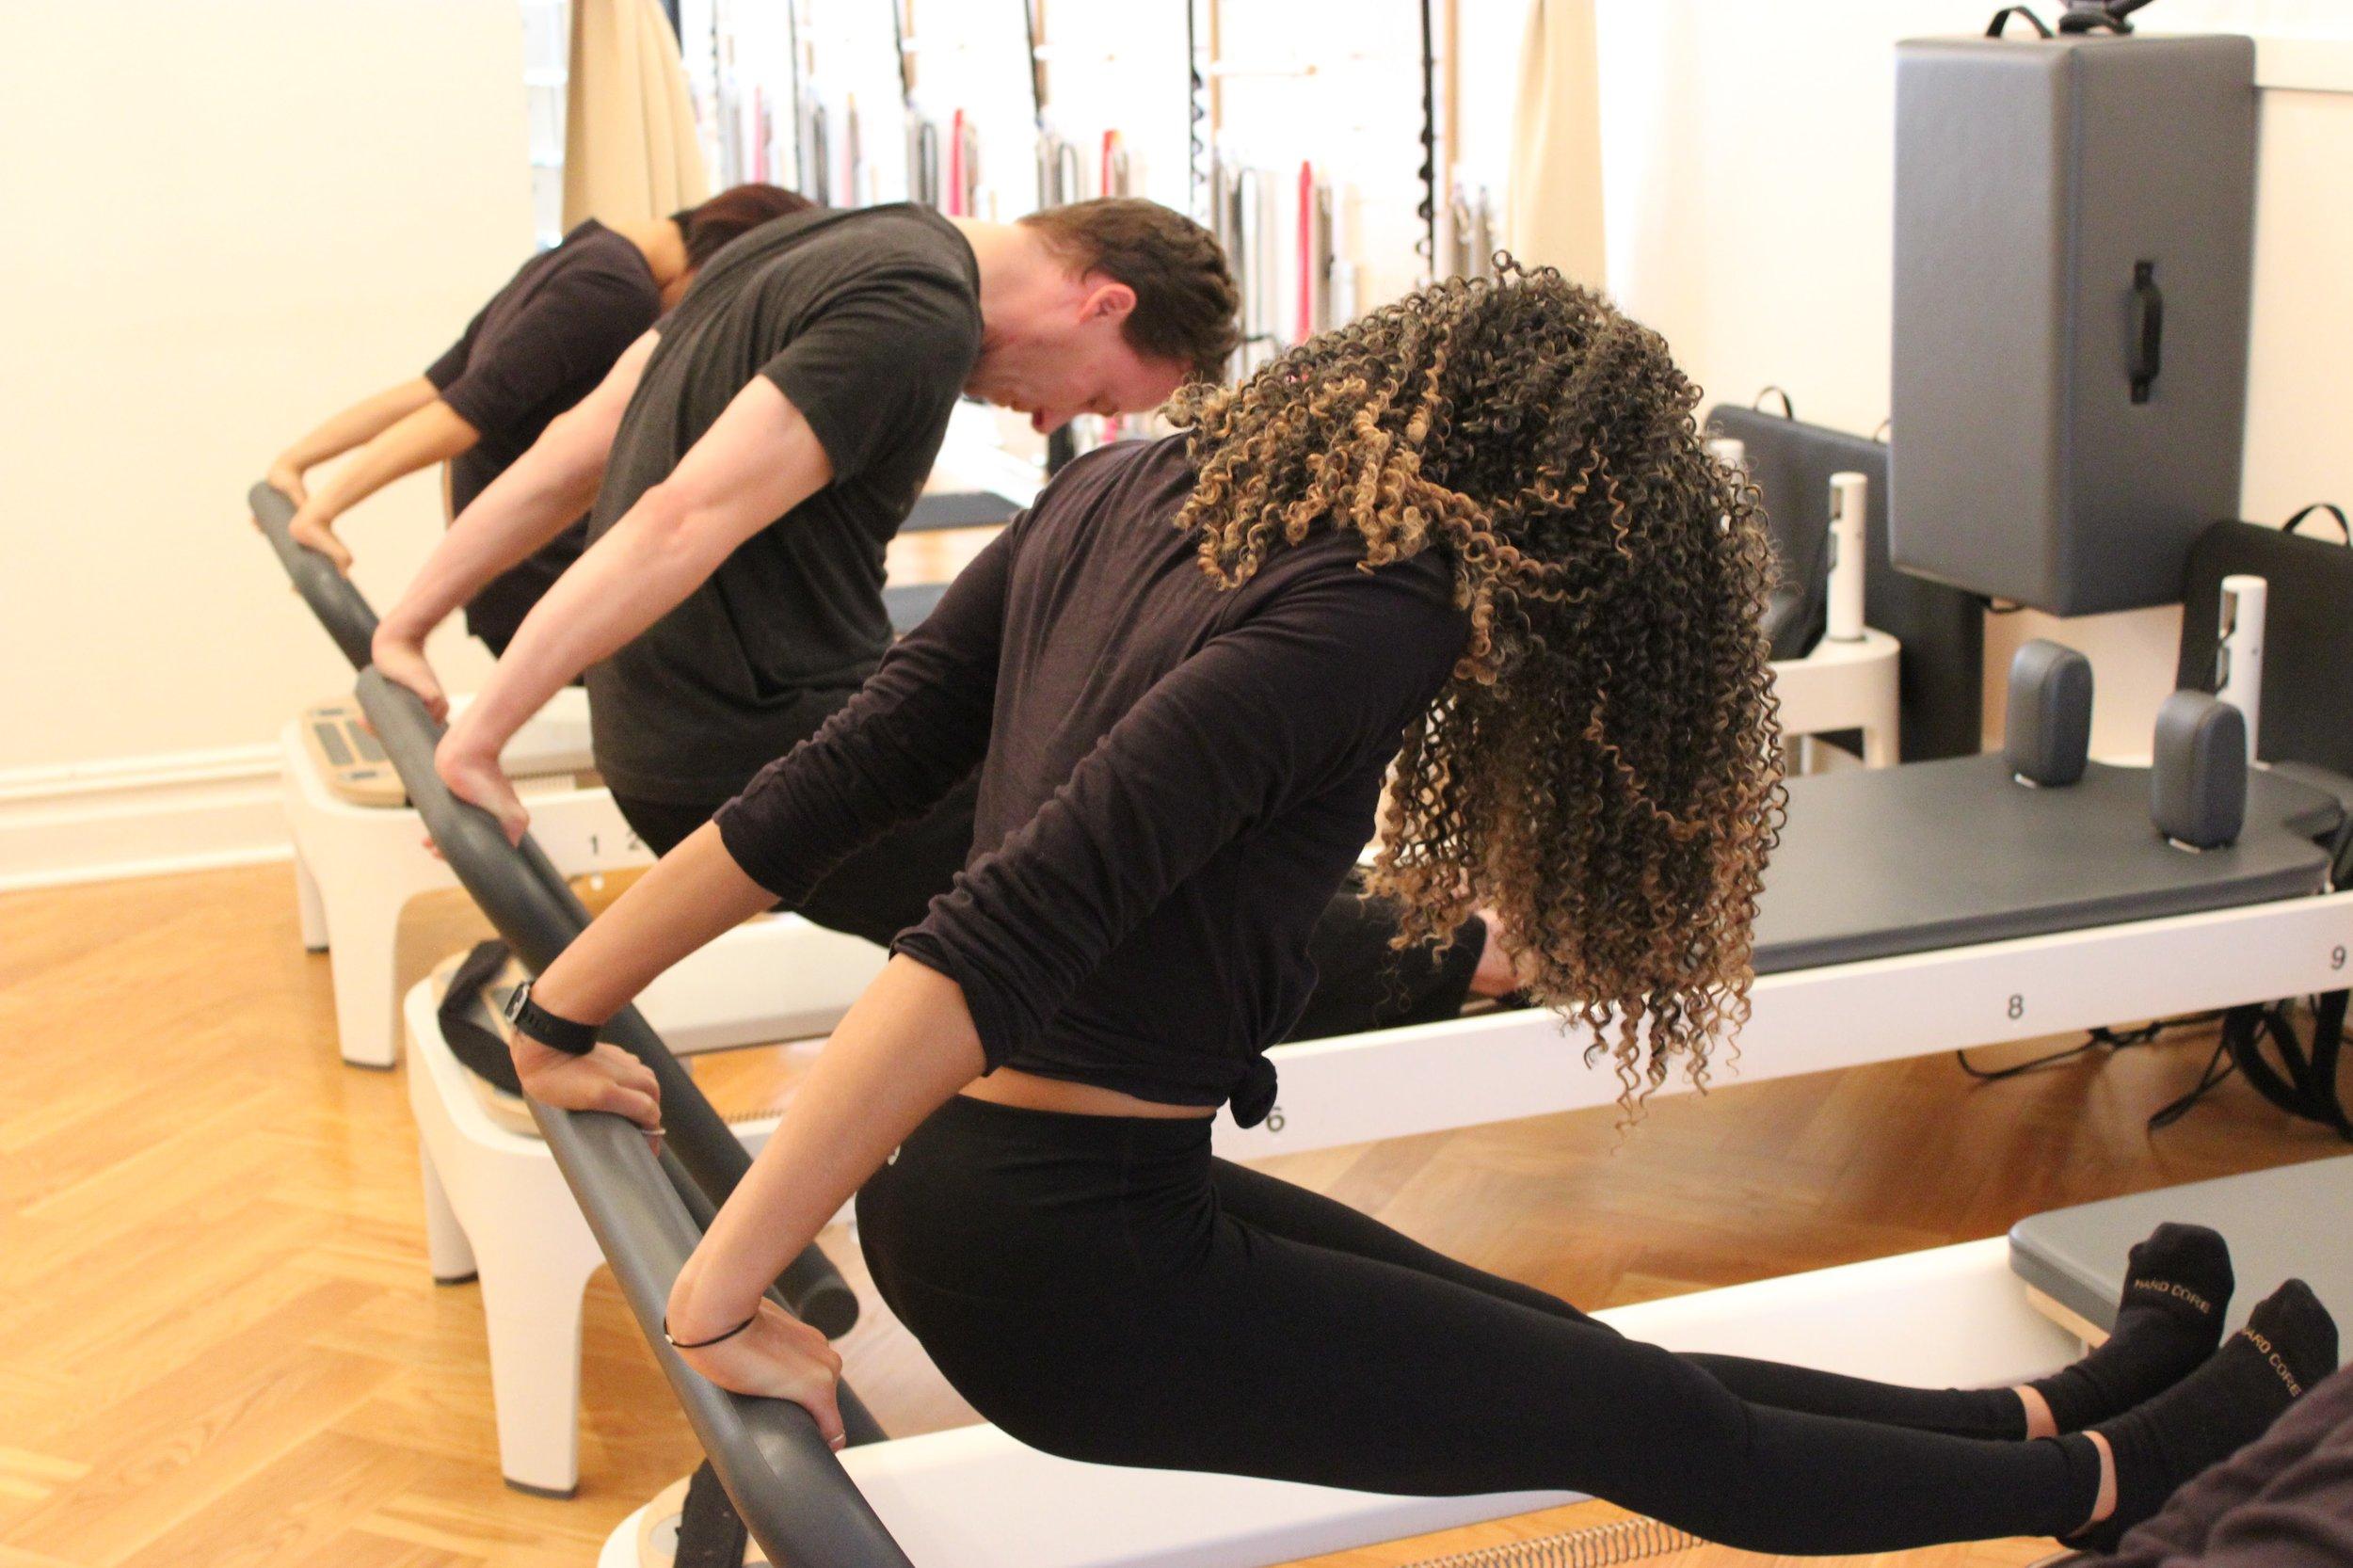 pilates-reformer-classes-upper-east-side-sutton-place